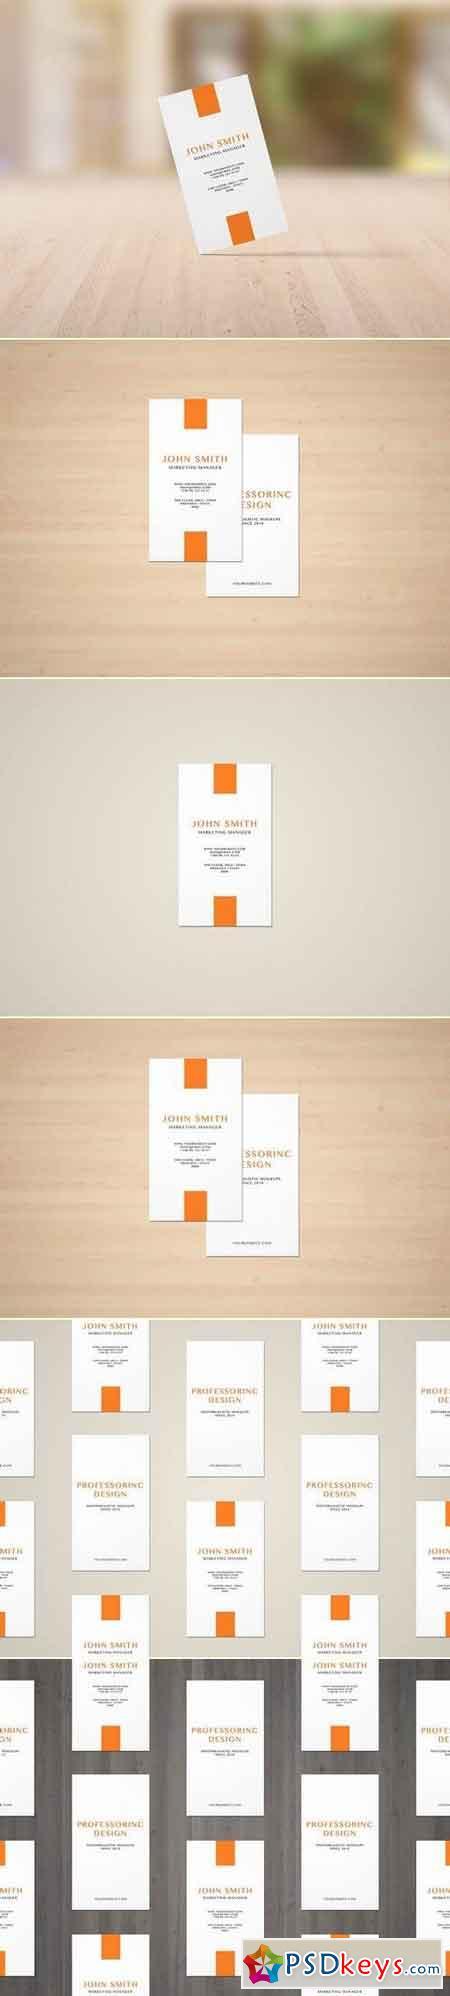 3.5x2'' Portrait Business Card Mockup